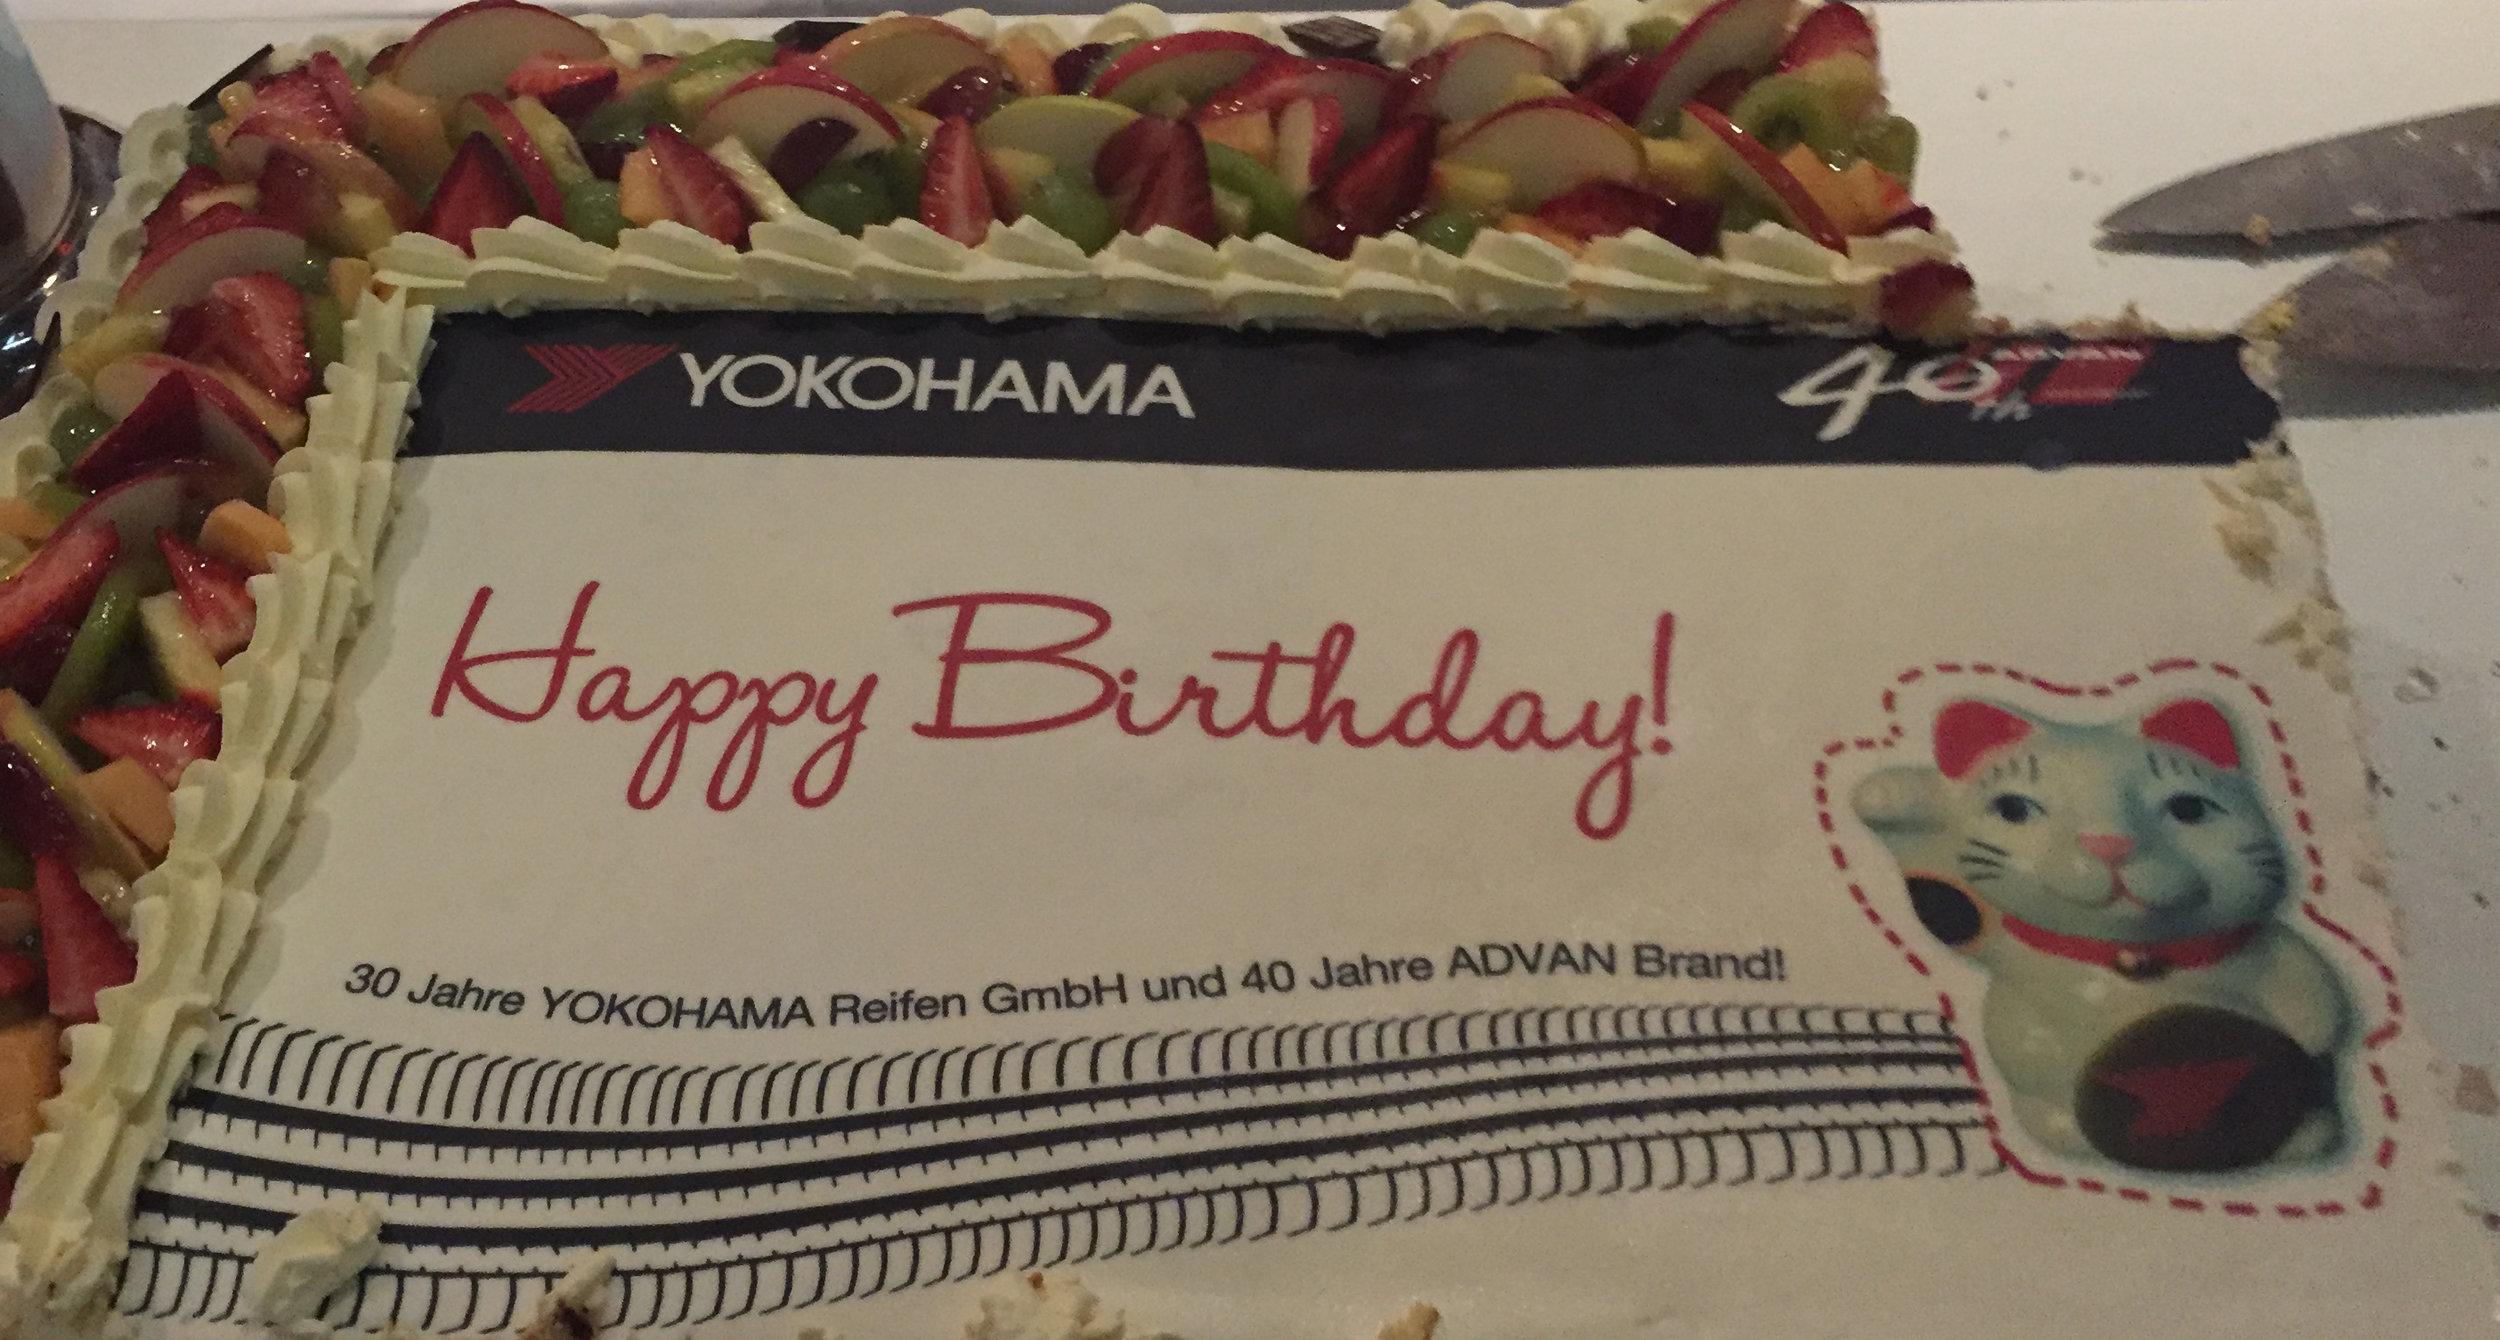 YOKOHAMA Reifen GmbH 30 Jahre Geburtstagstorte 2018